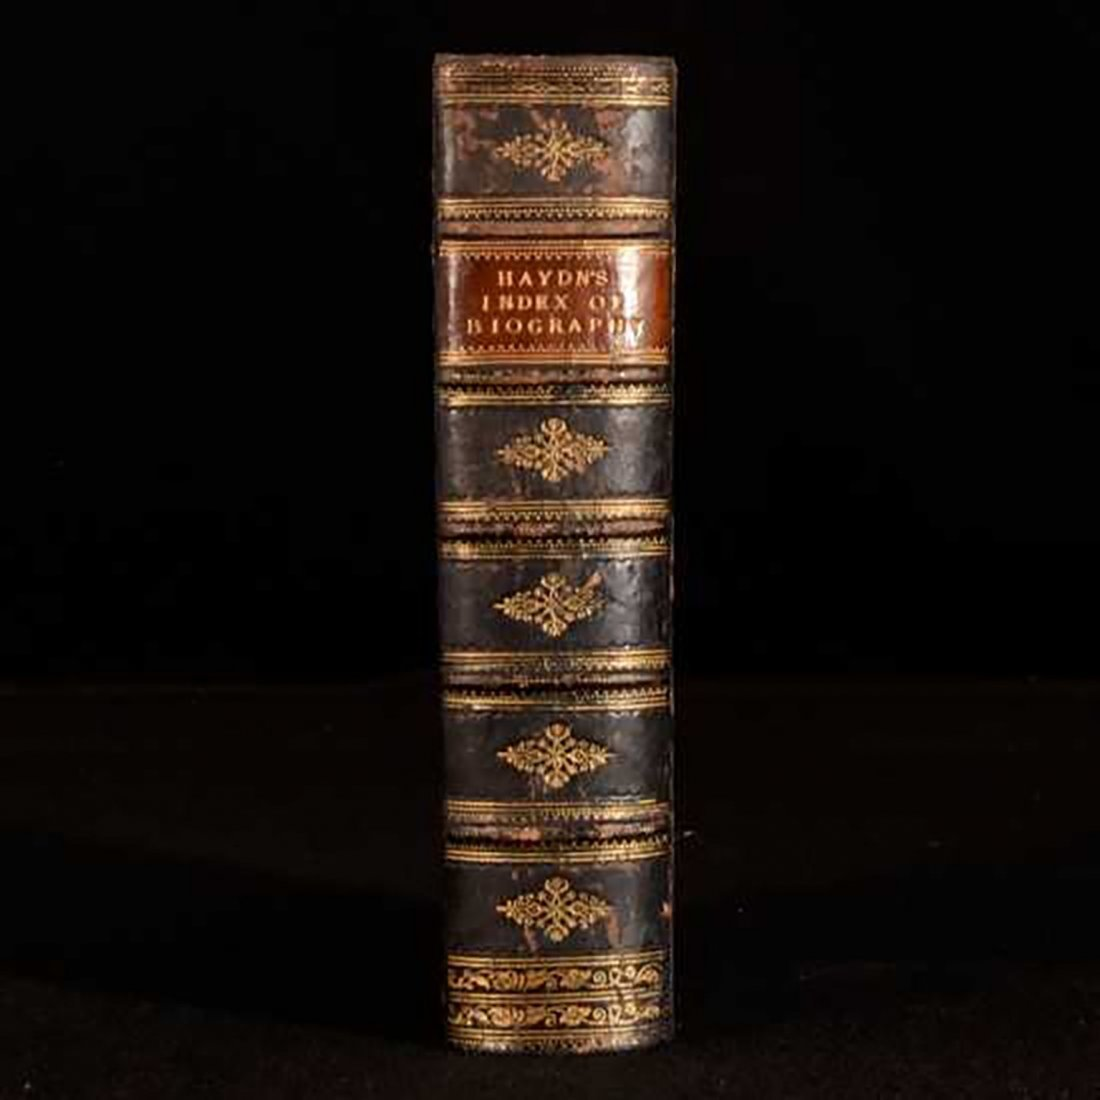 Rare 1770 Edition of the Works of Roman Lyric Poem